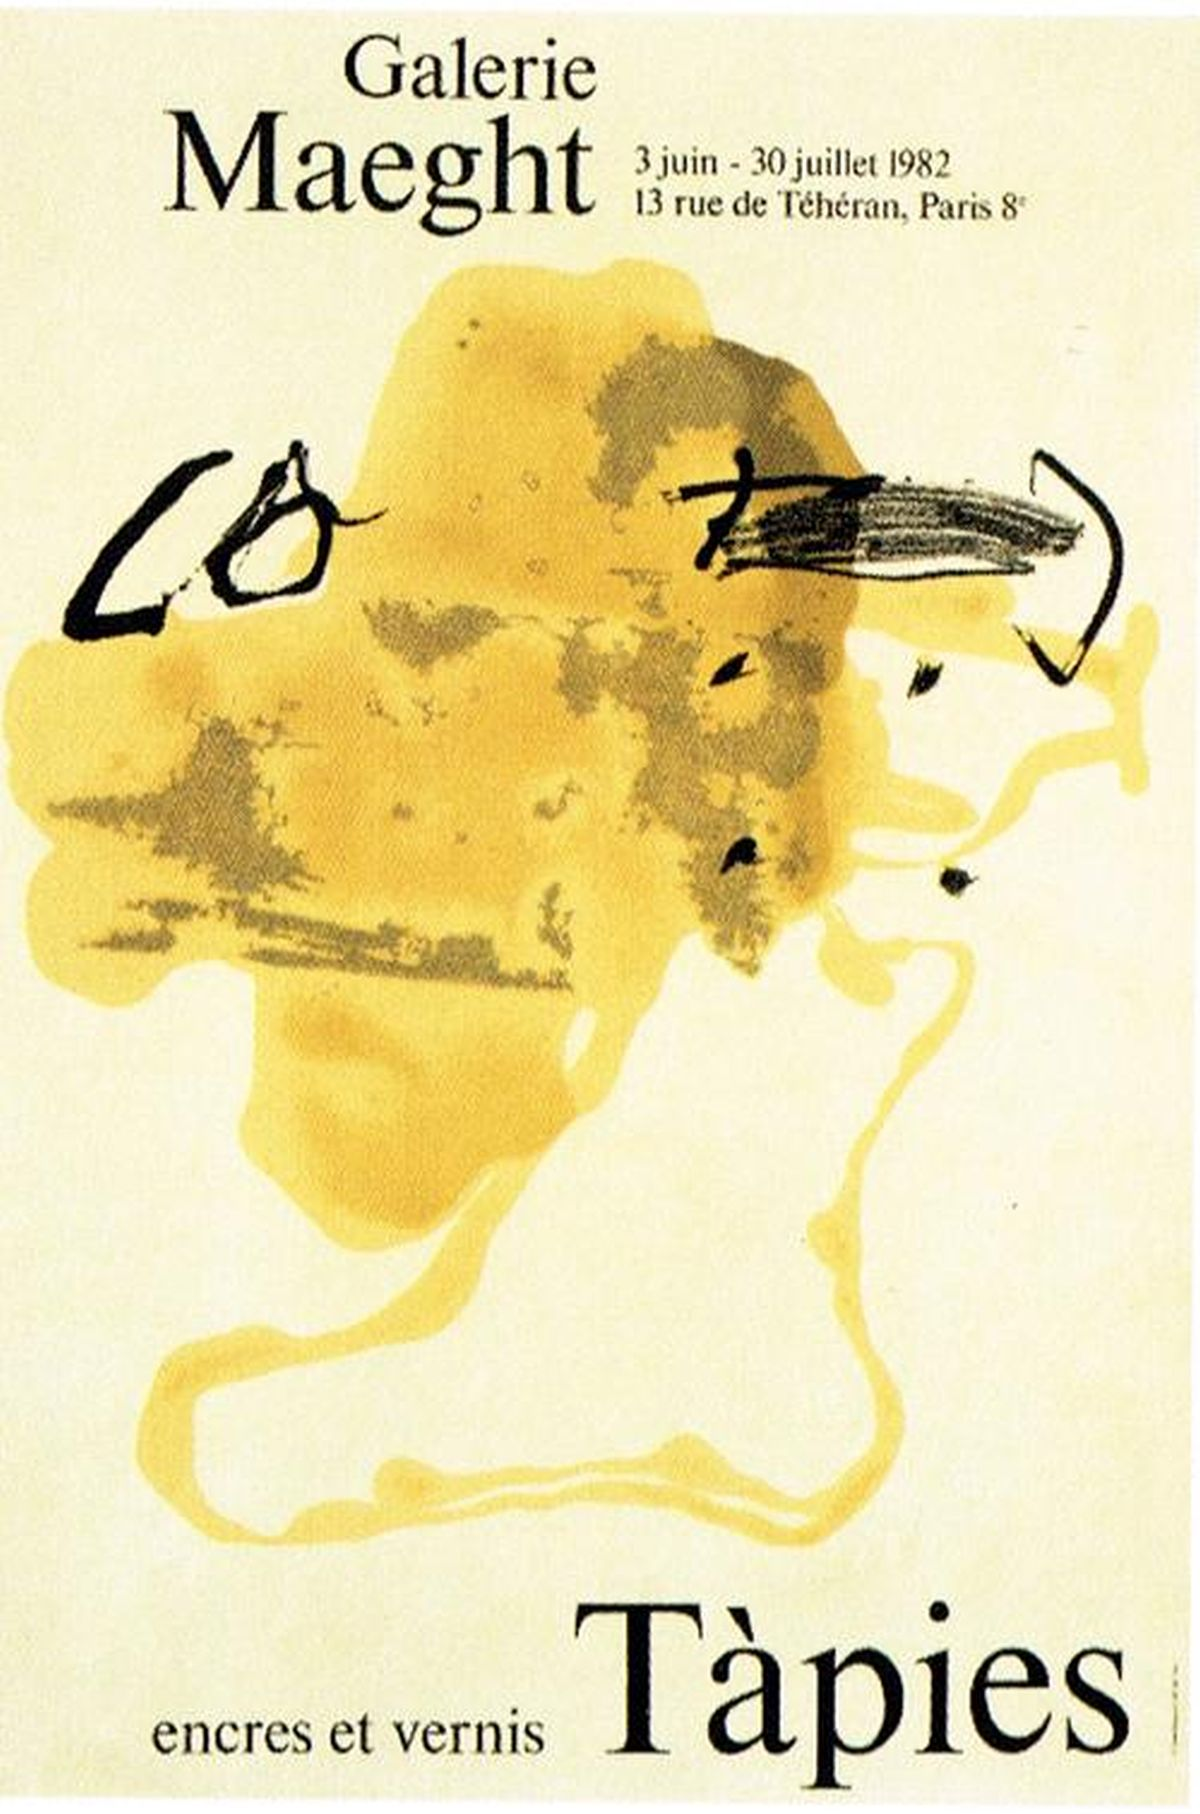 Antoni Tapies - Originallithografie, 1982 kopen? Bied vanaf 72!